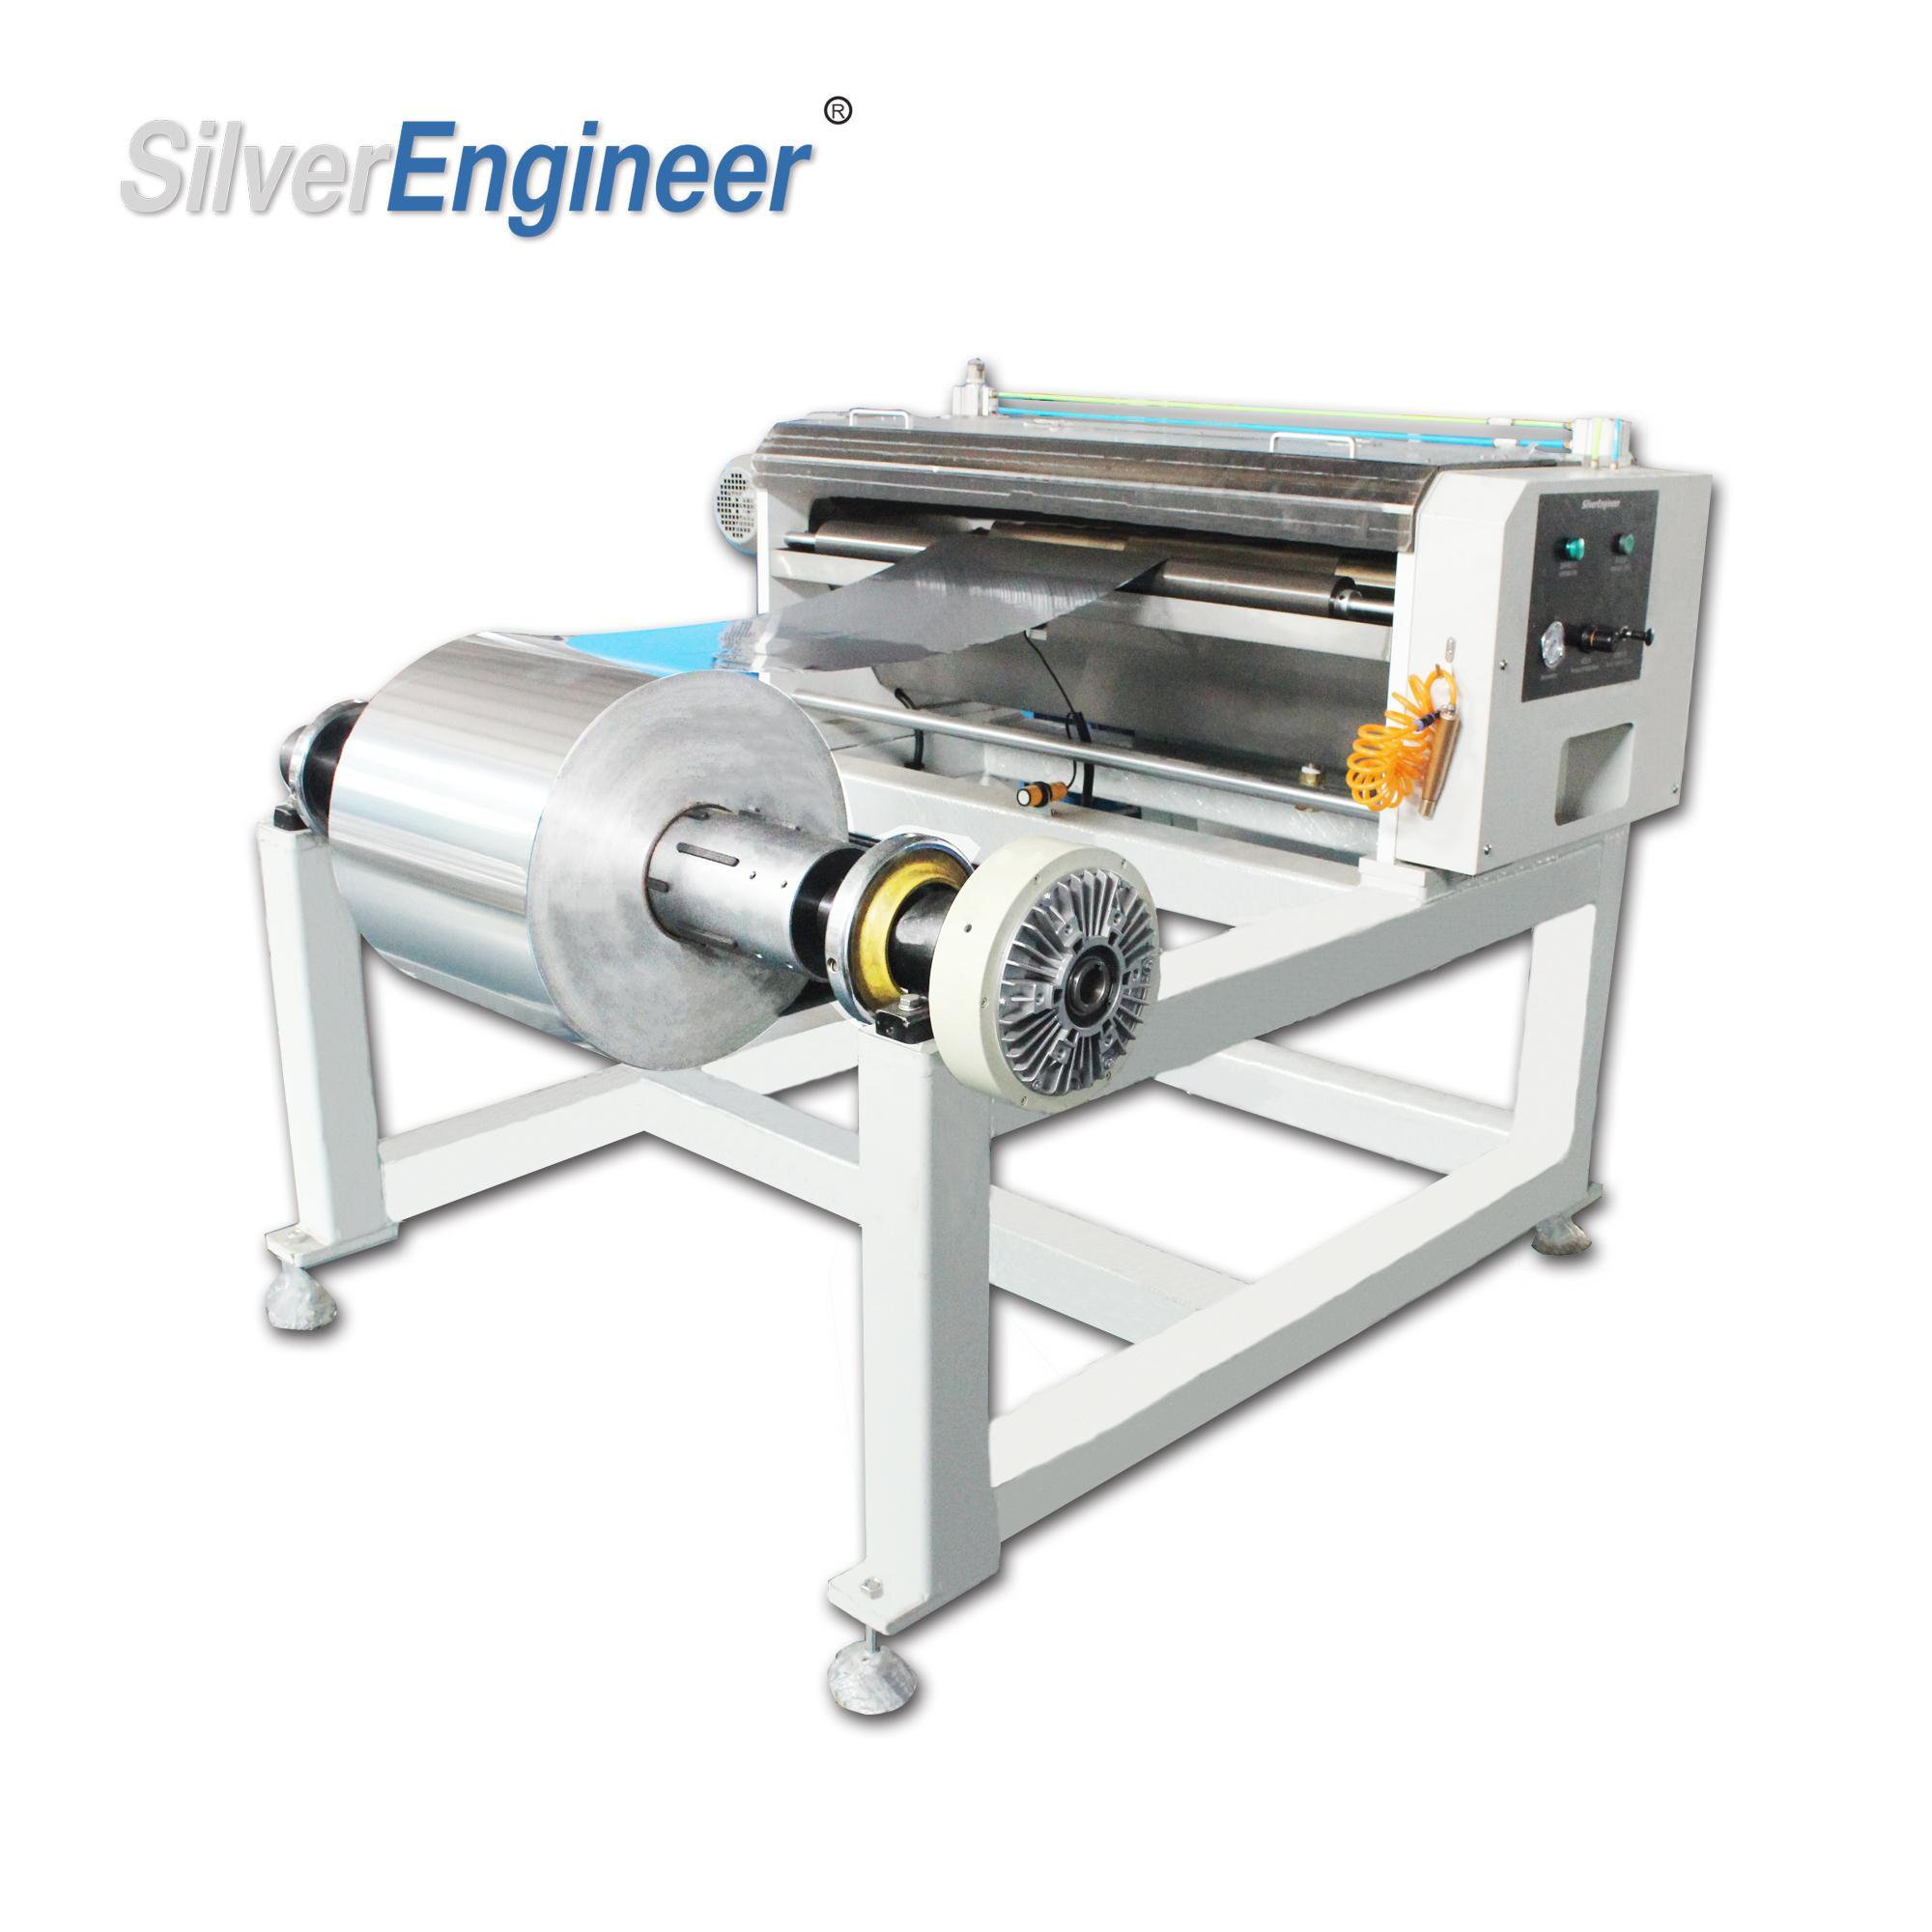 Aluminum Foil Container Product Line Smart Pneumatic Punching Machine 7